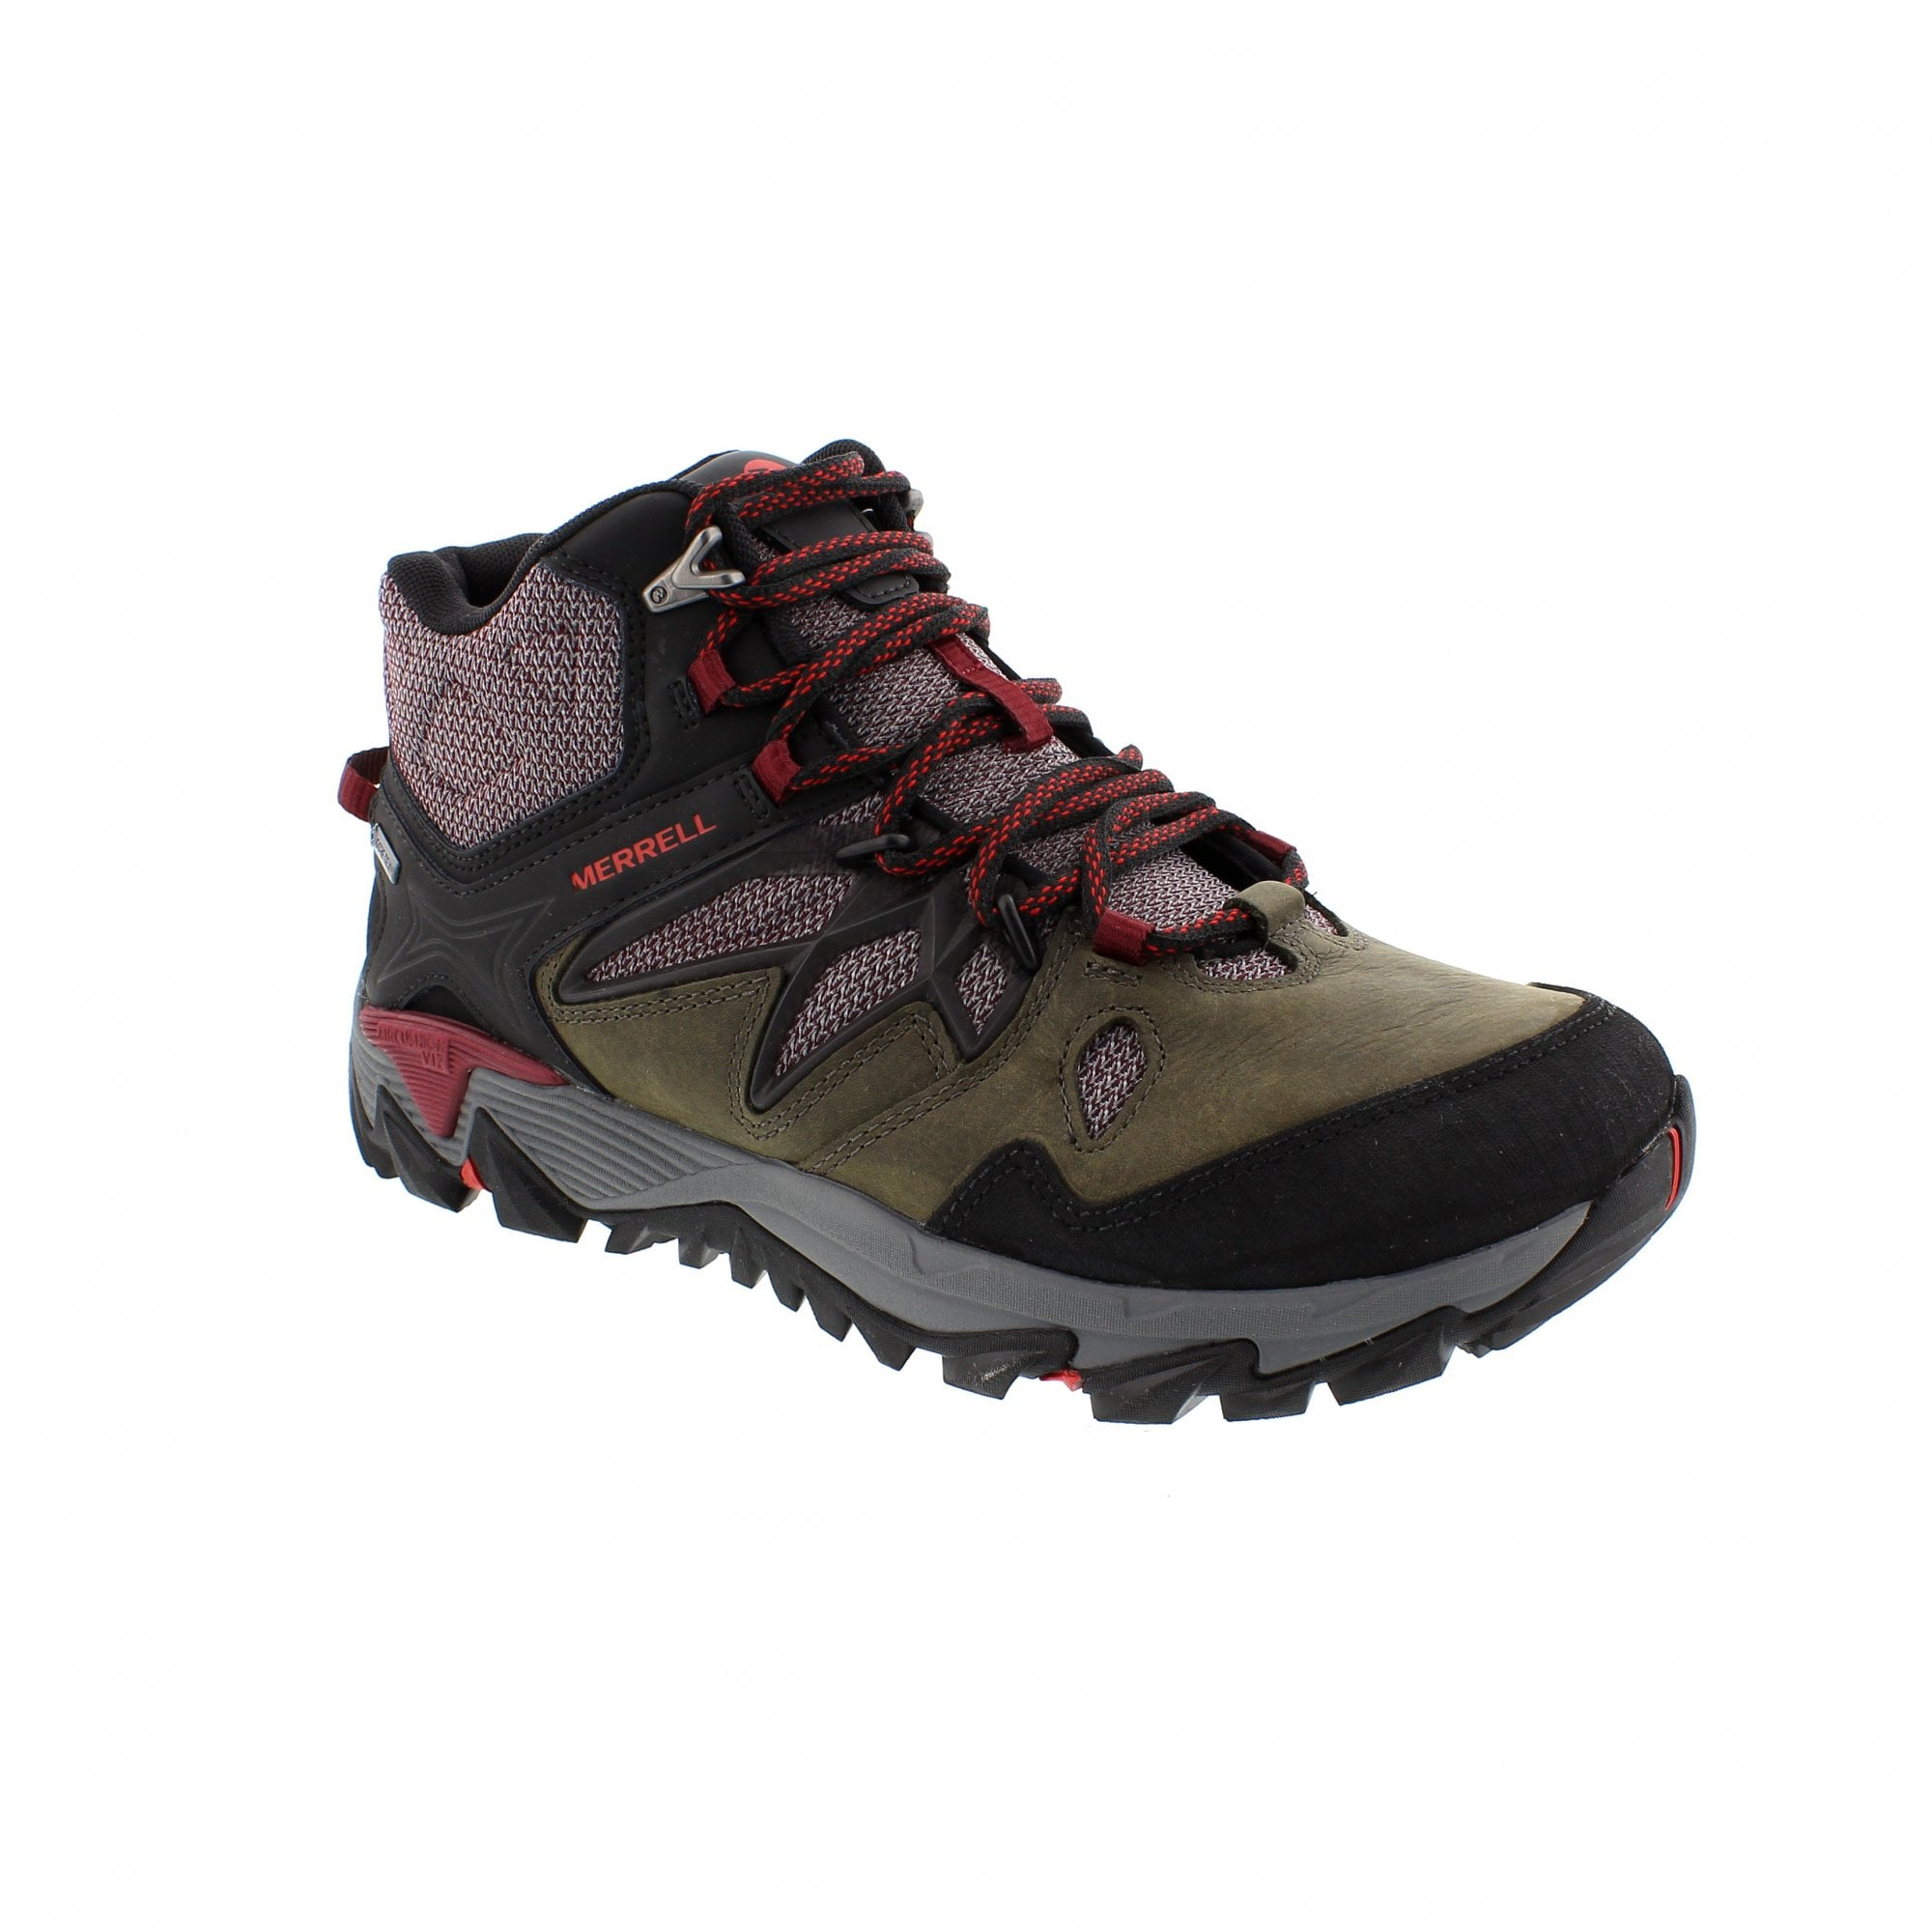 Merrell All Out Blaze 2 Mid Gore-Tex J41052 Womens Walking Boots ... 10a194de91a